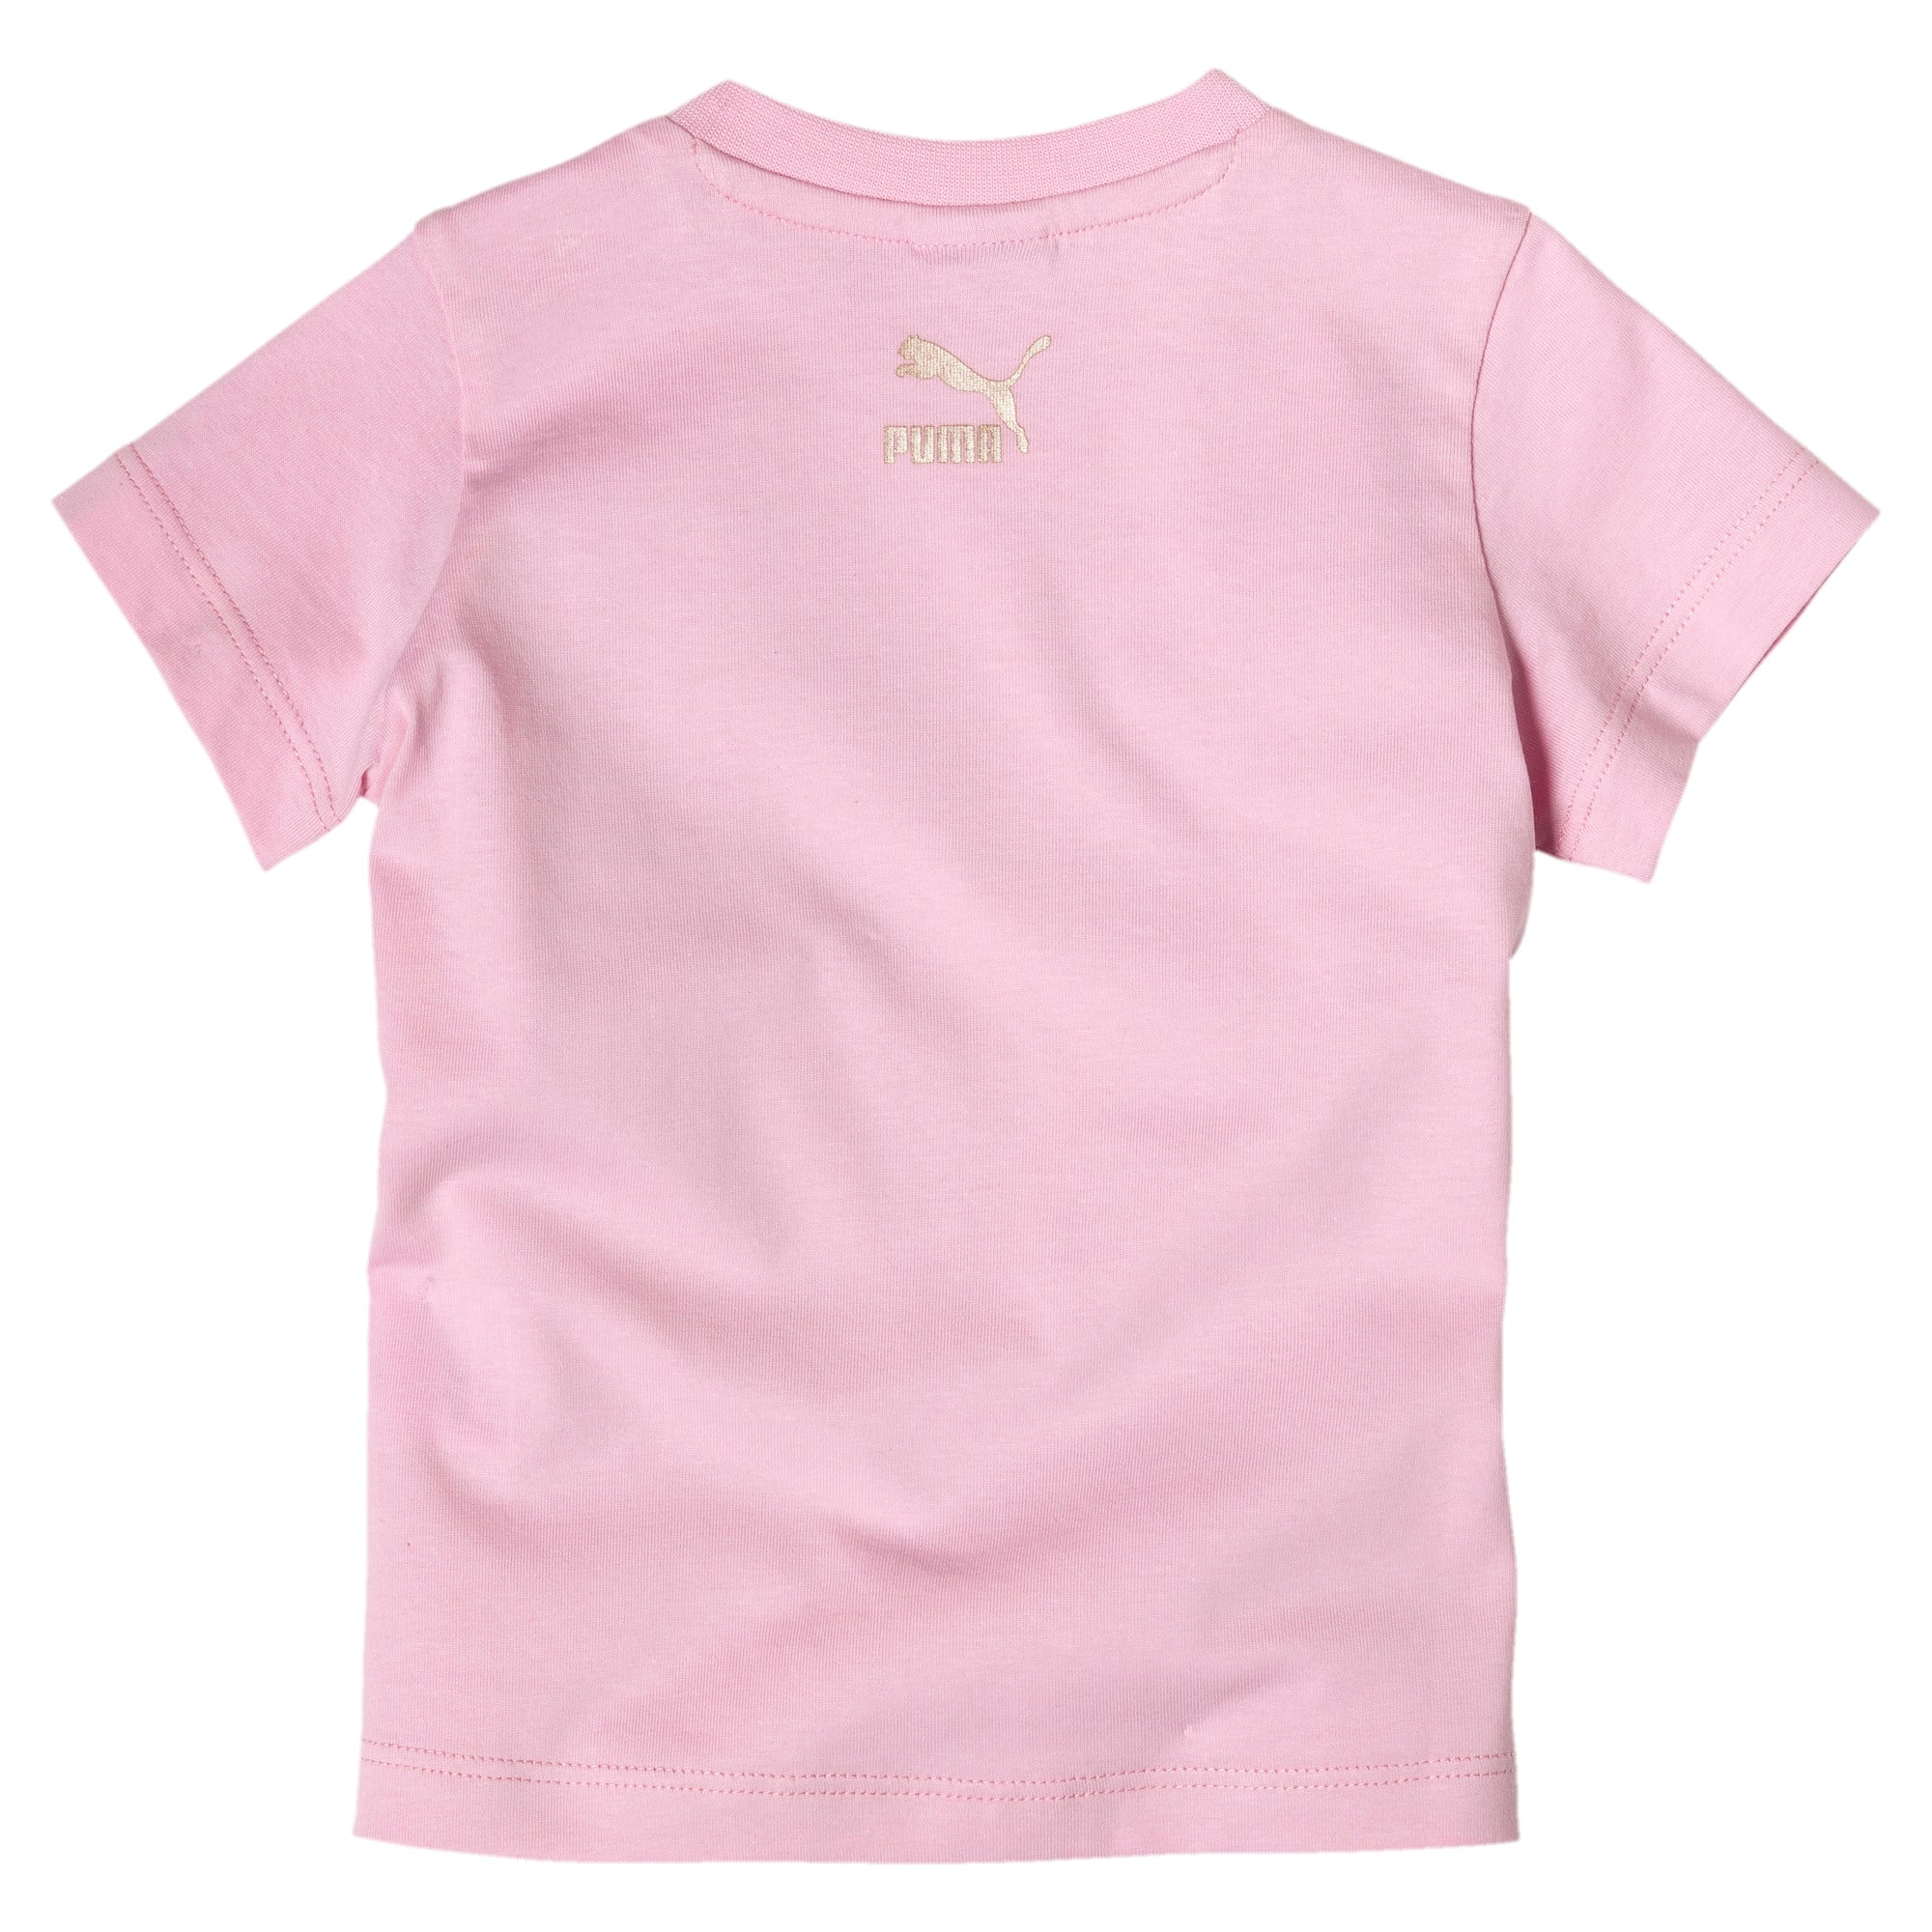 Thumbnail 2 of Easter Babies' Tee, Pale Pink, medium